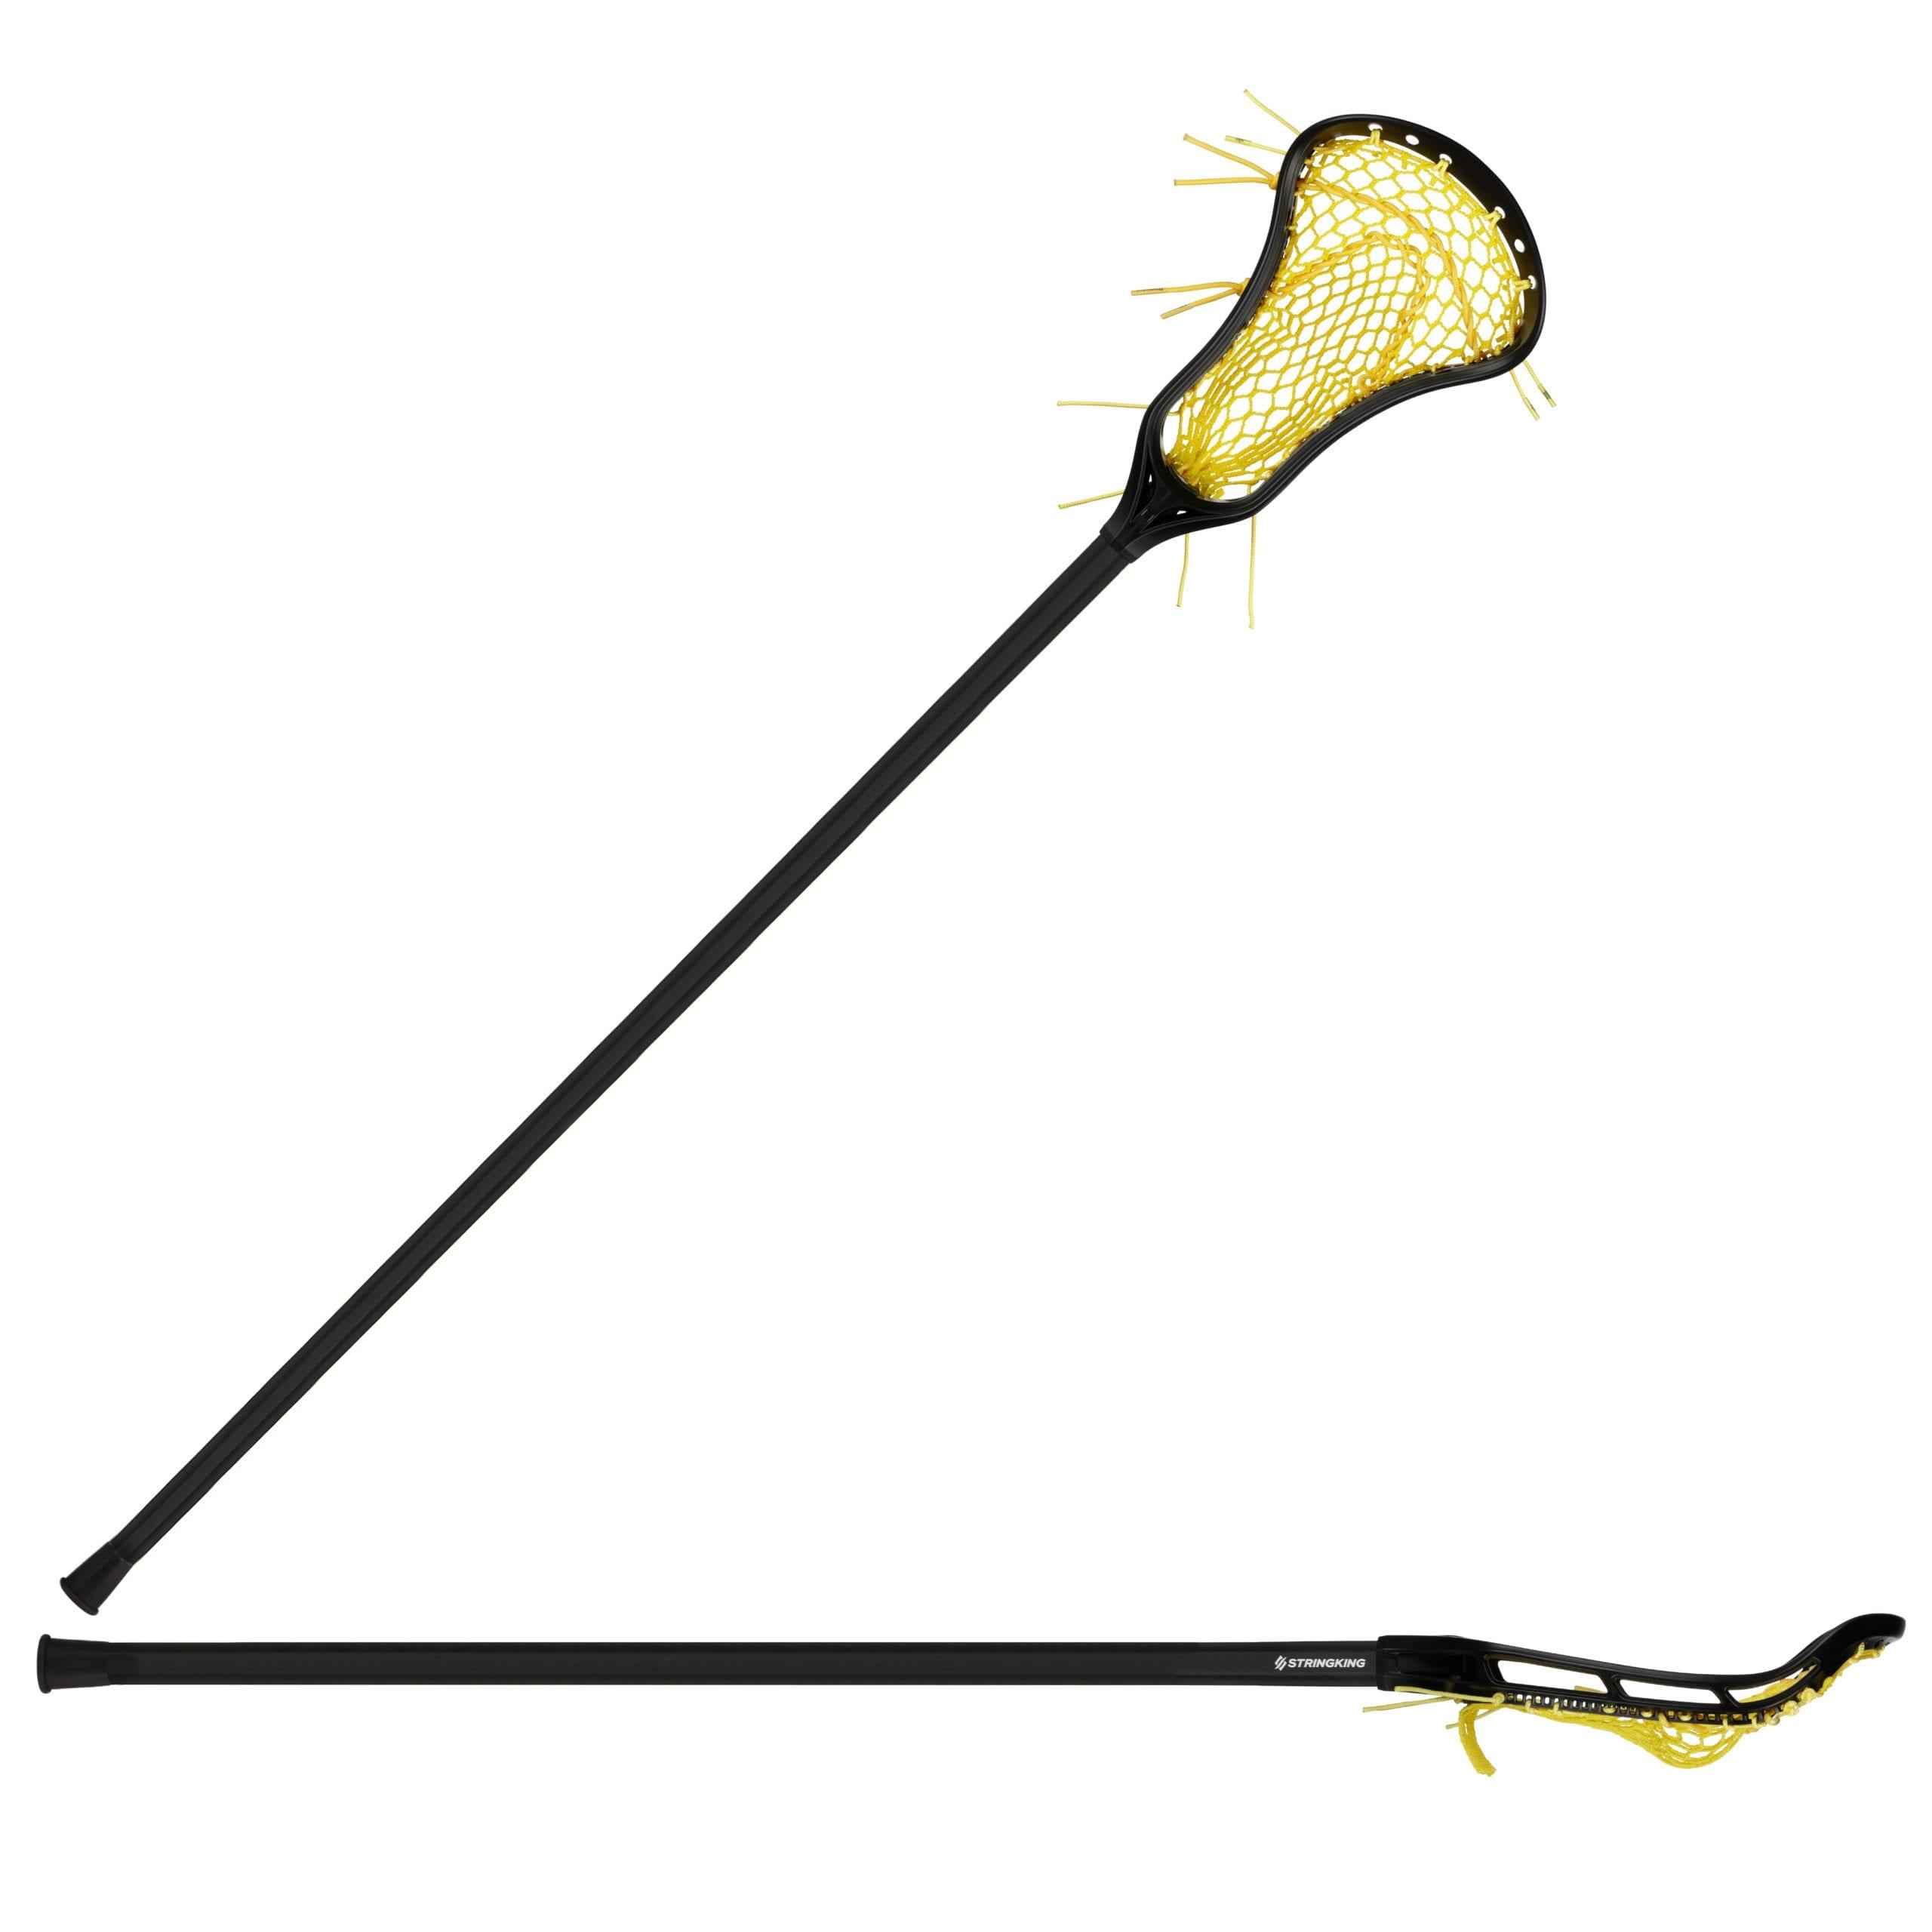 StringKing-Womens-Complete-Lacrosse-Stick-Black-Yellow-Full-scaled-1.jpg